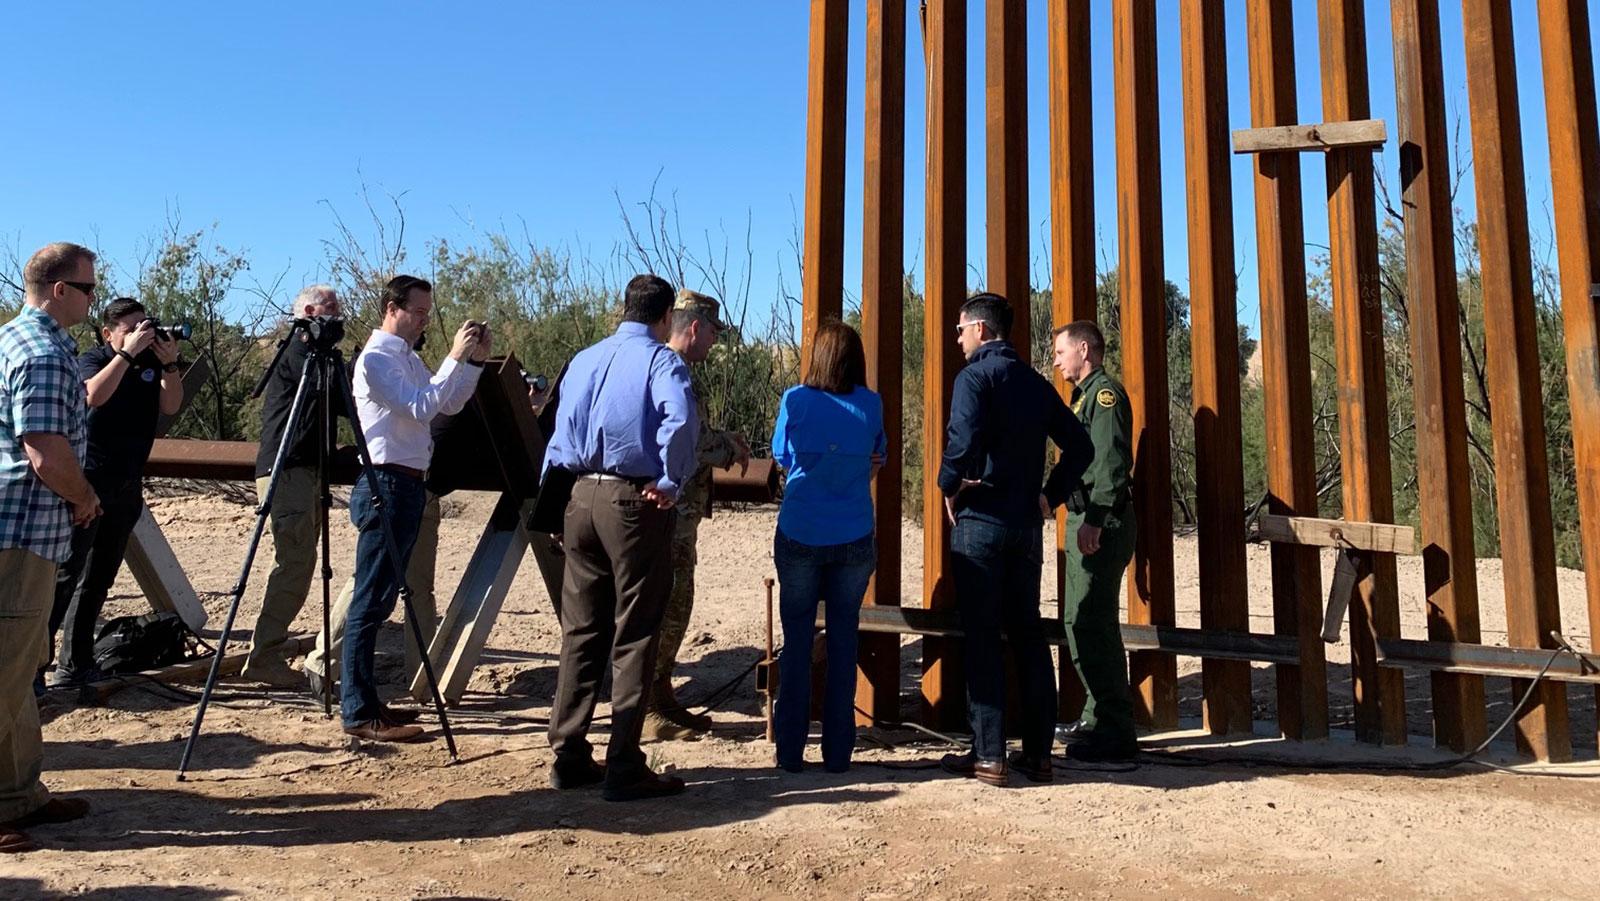 The U.S.-Mexico border wall is seen in an undated photo. (Jason Kravarik/CNN)